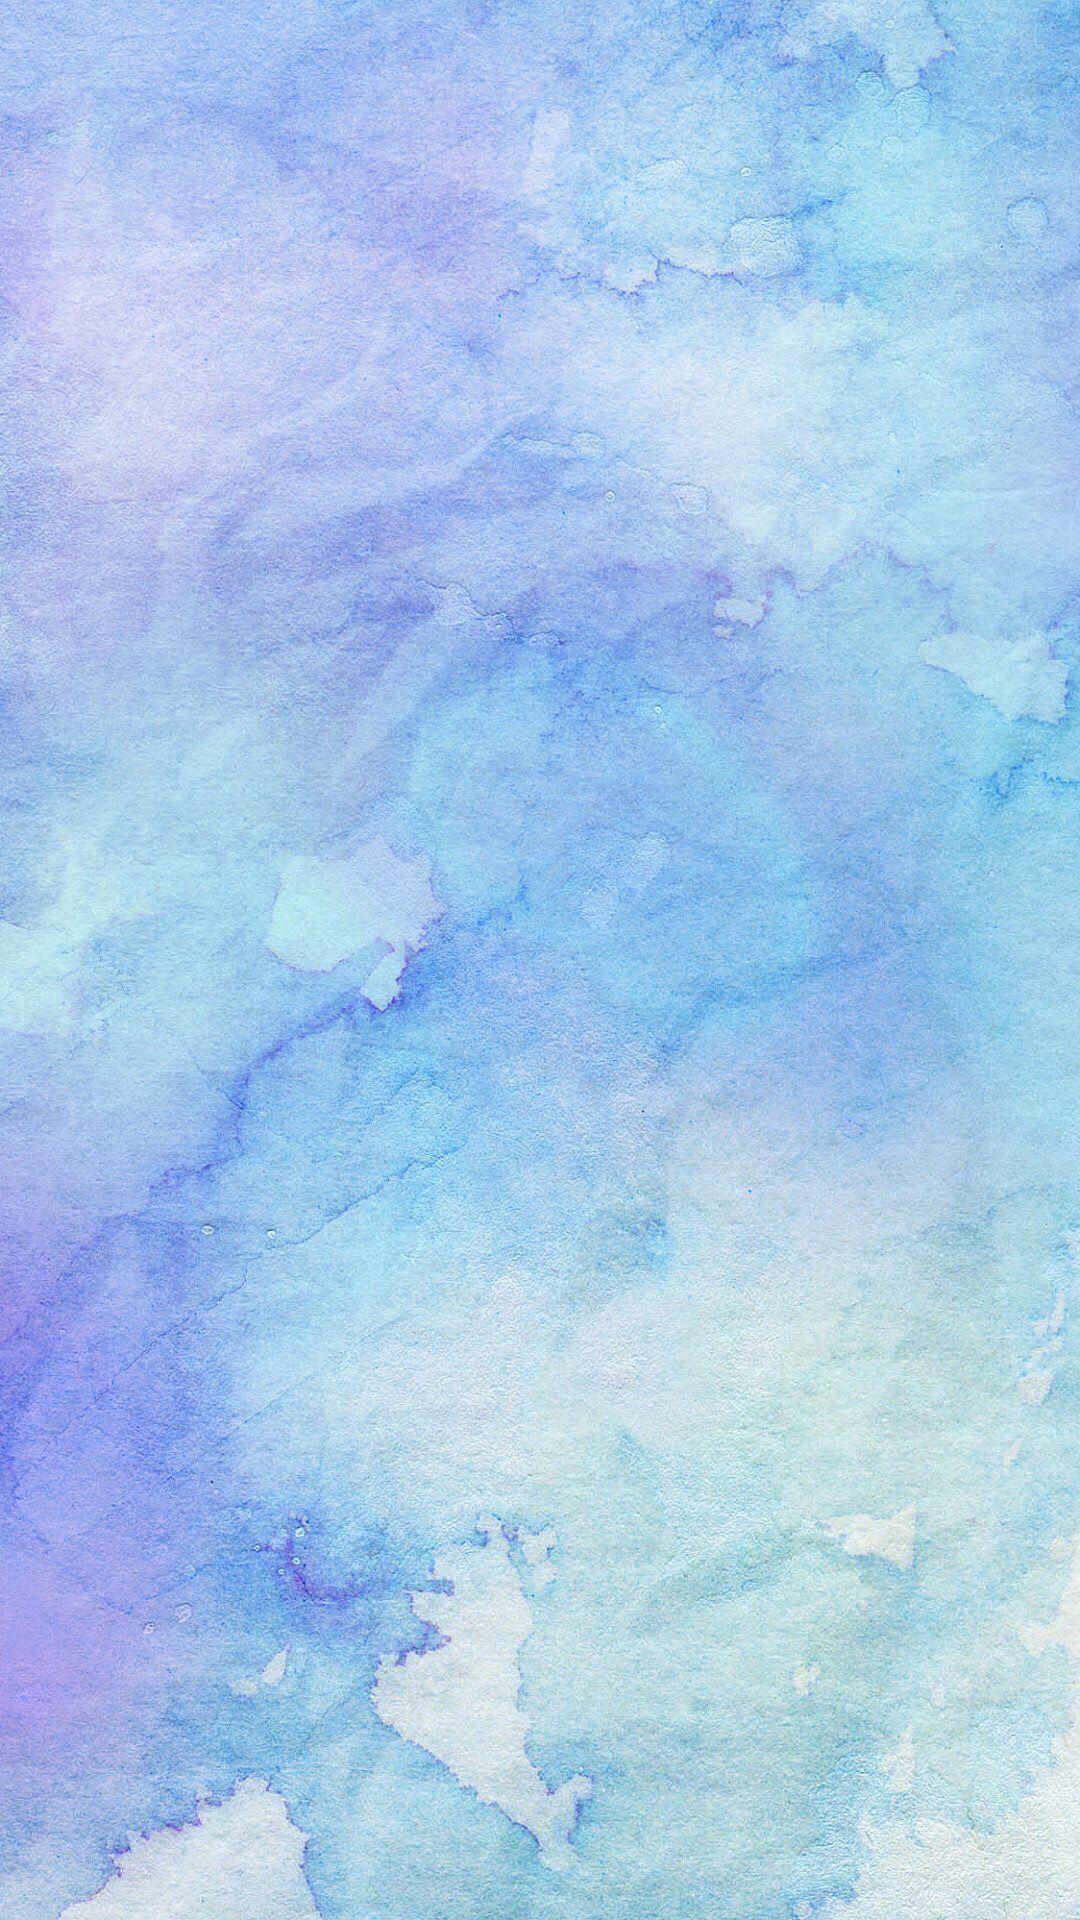 Pastel Blue Pattern Wallpaper Download Watercolor Wallpaper Watercolor Blue Background Blue Wallpaper Iphone